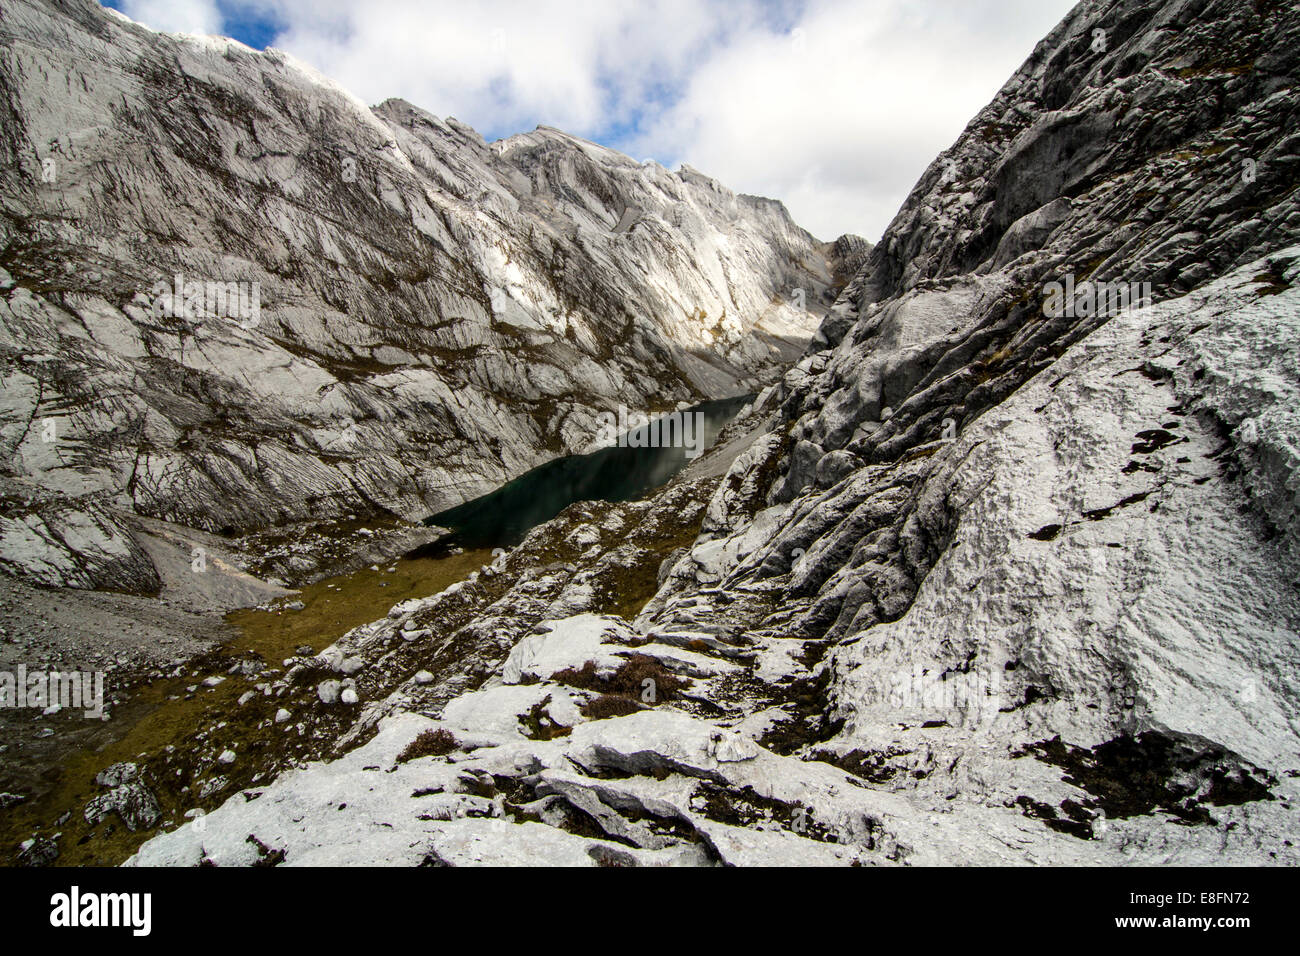 Papua, View of Idenberg valley with Mt. Jayawijaya - Stock Image